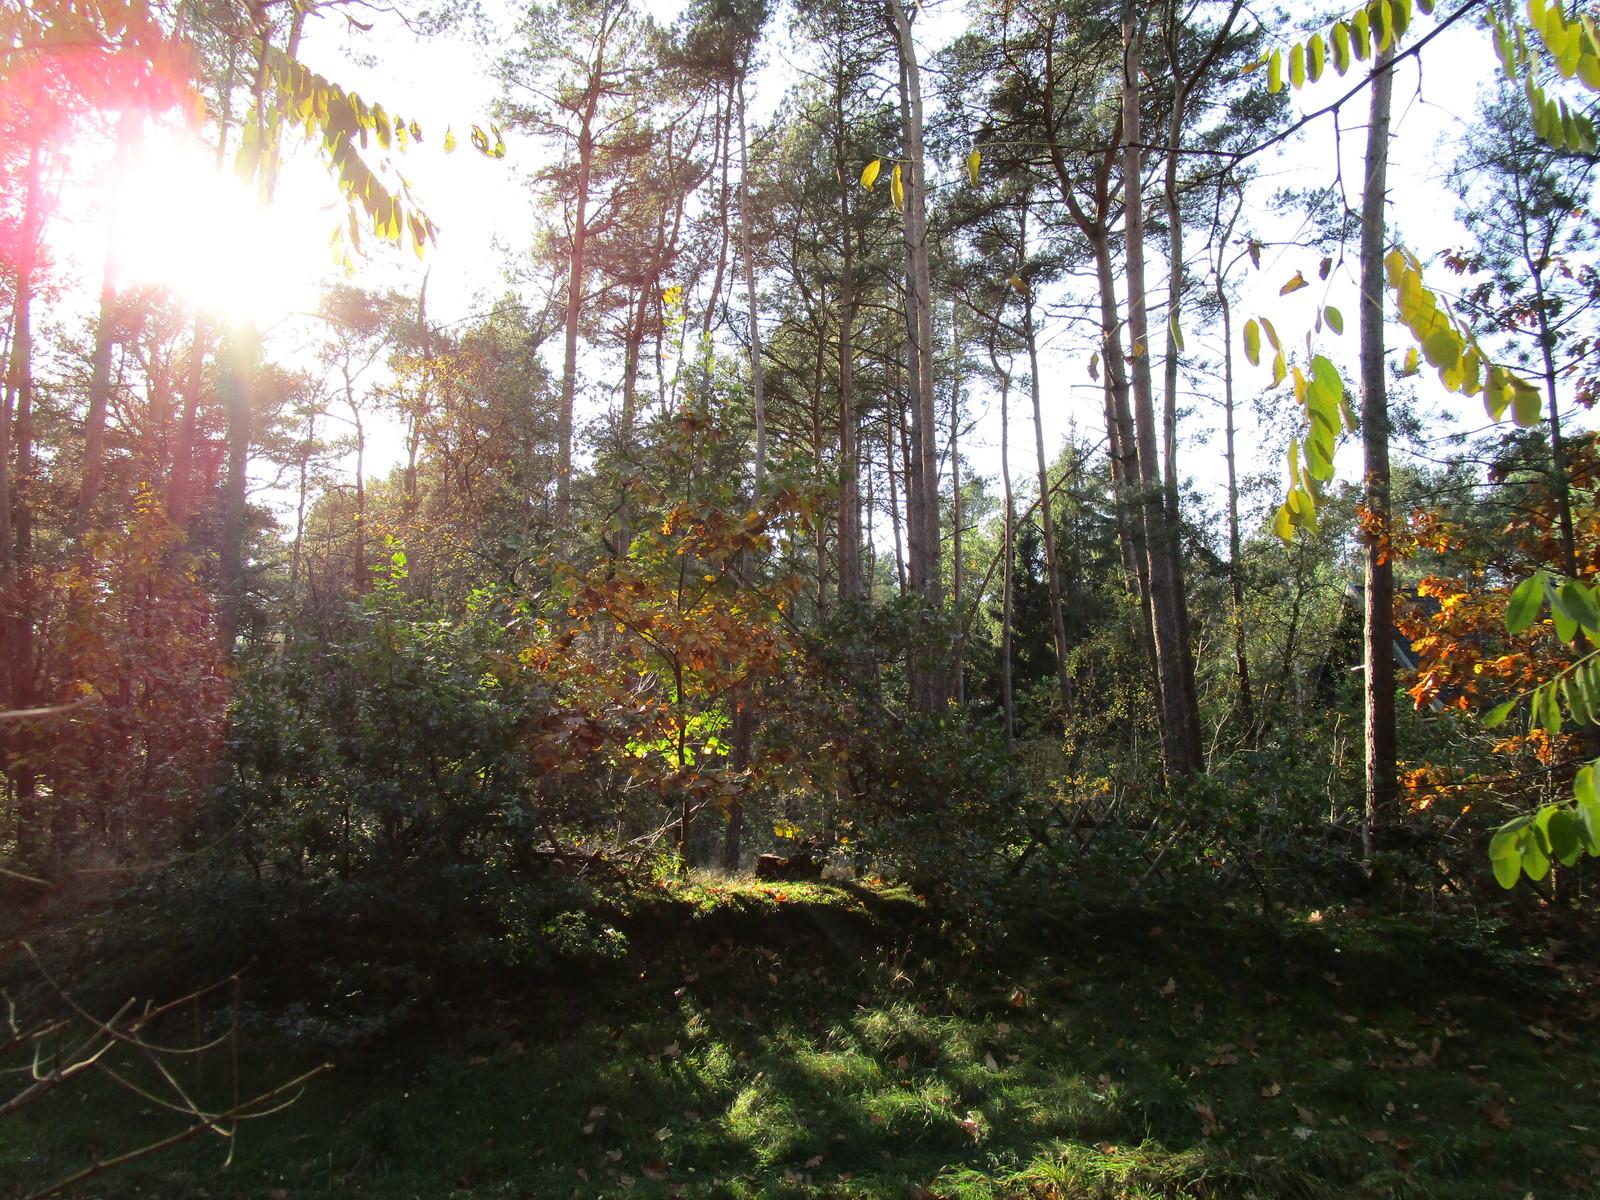 Waldgrundstück bauberater de bauberatung baubetreuung baufinanzierung